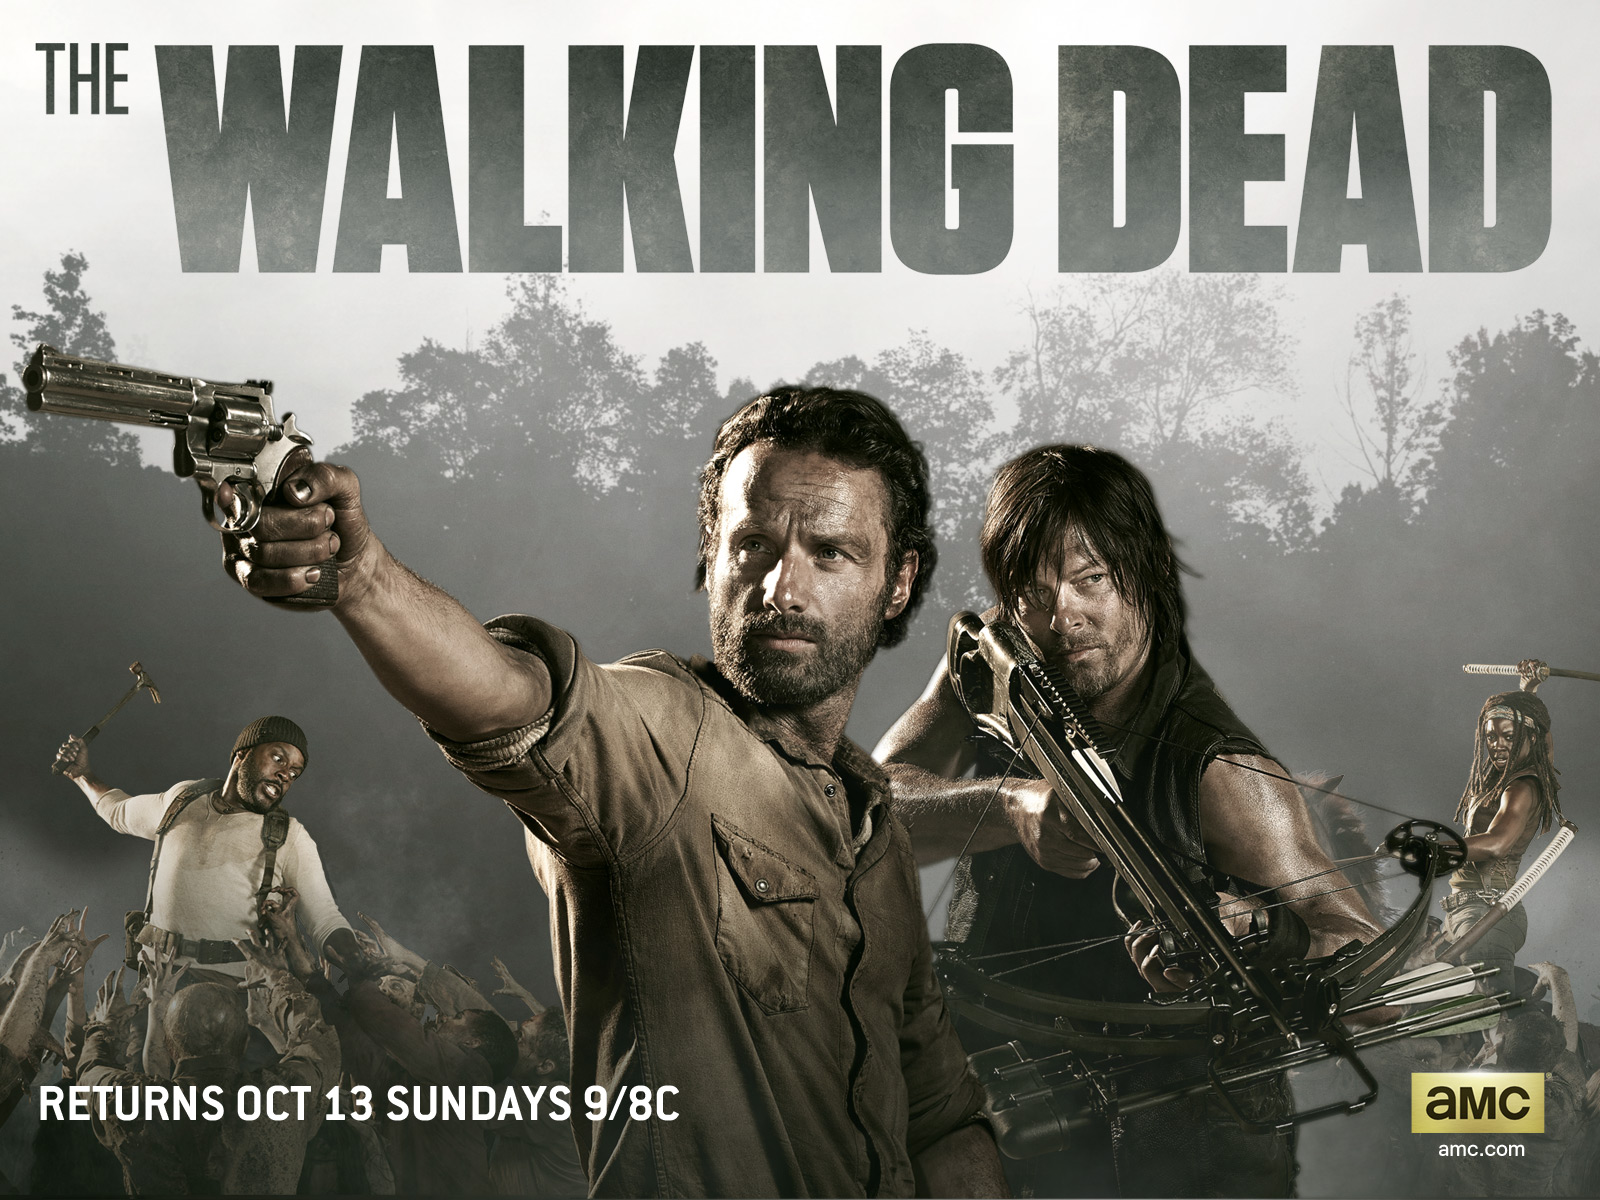 The Walking Dead season 4 wallpapers released   Movie Wallpapers 1600x1200